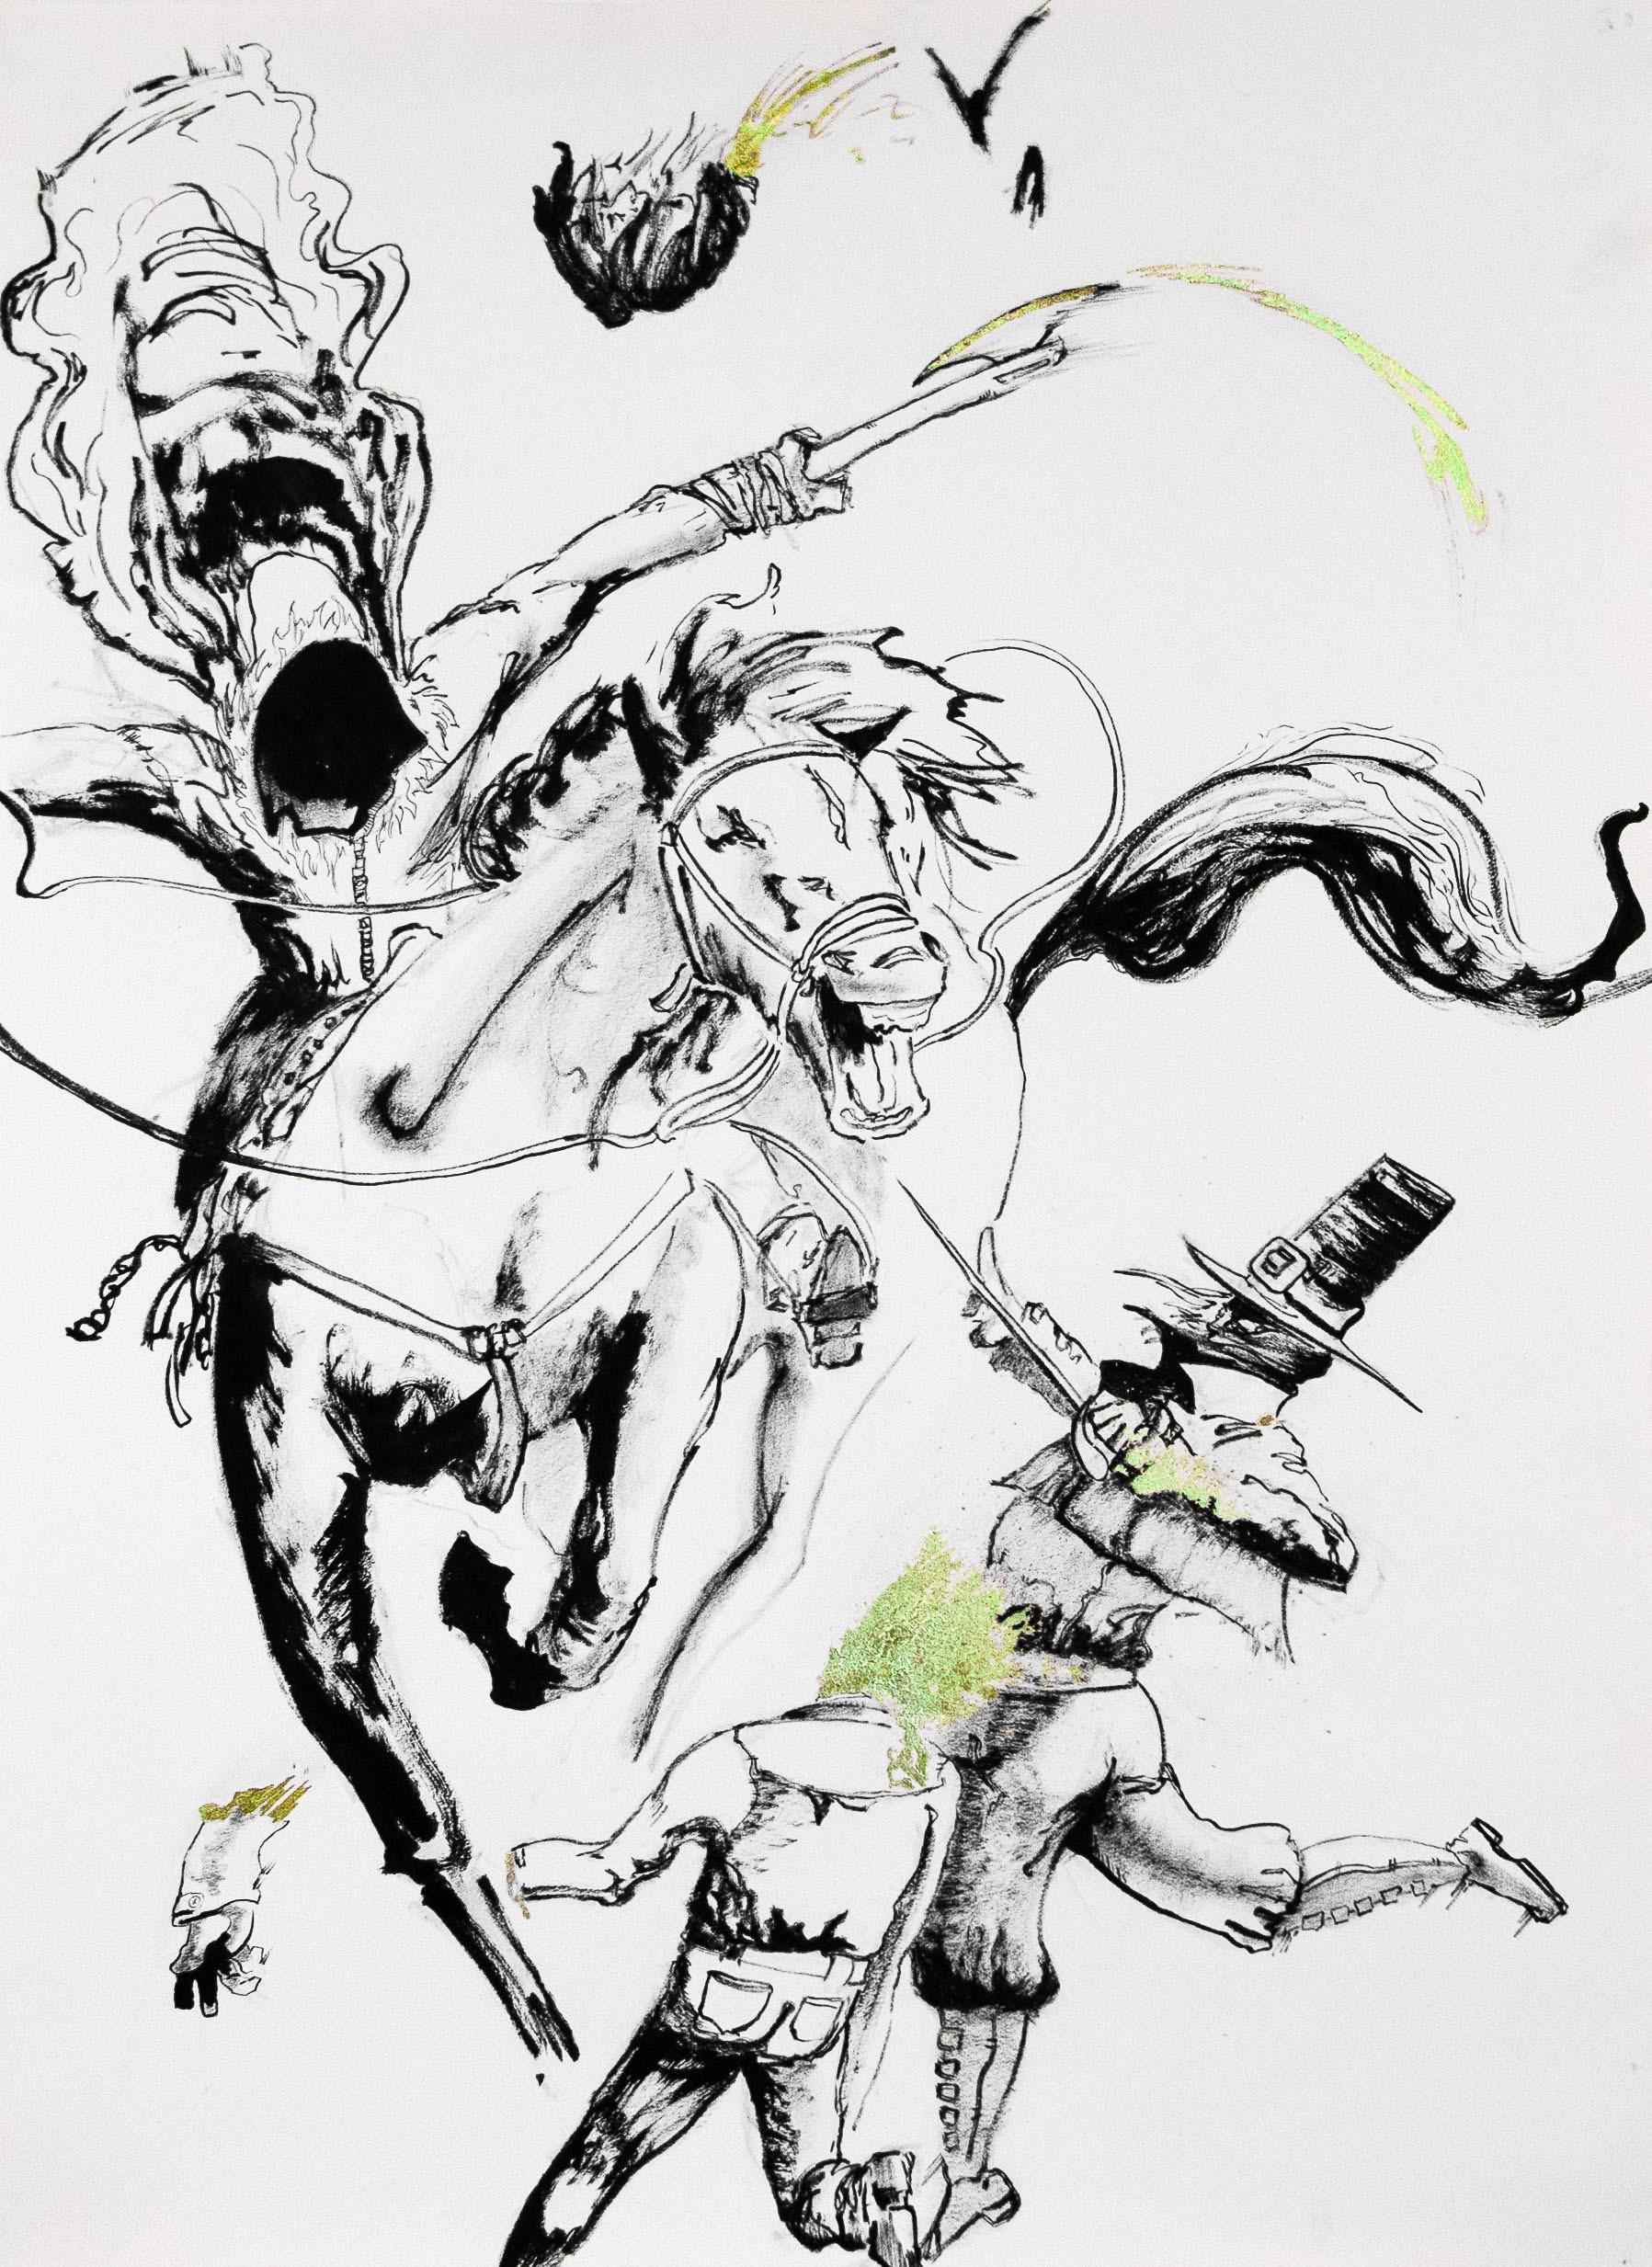 Galloping Hessian